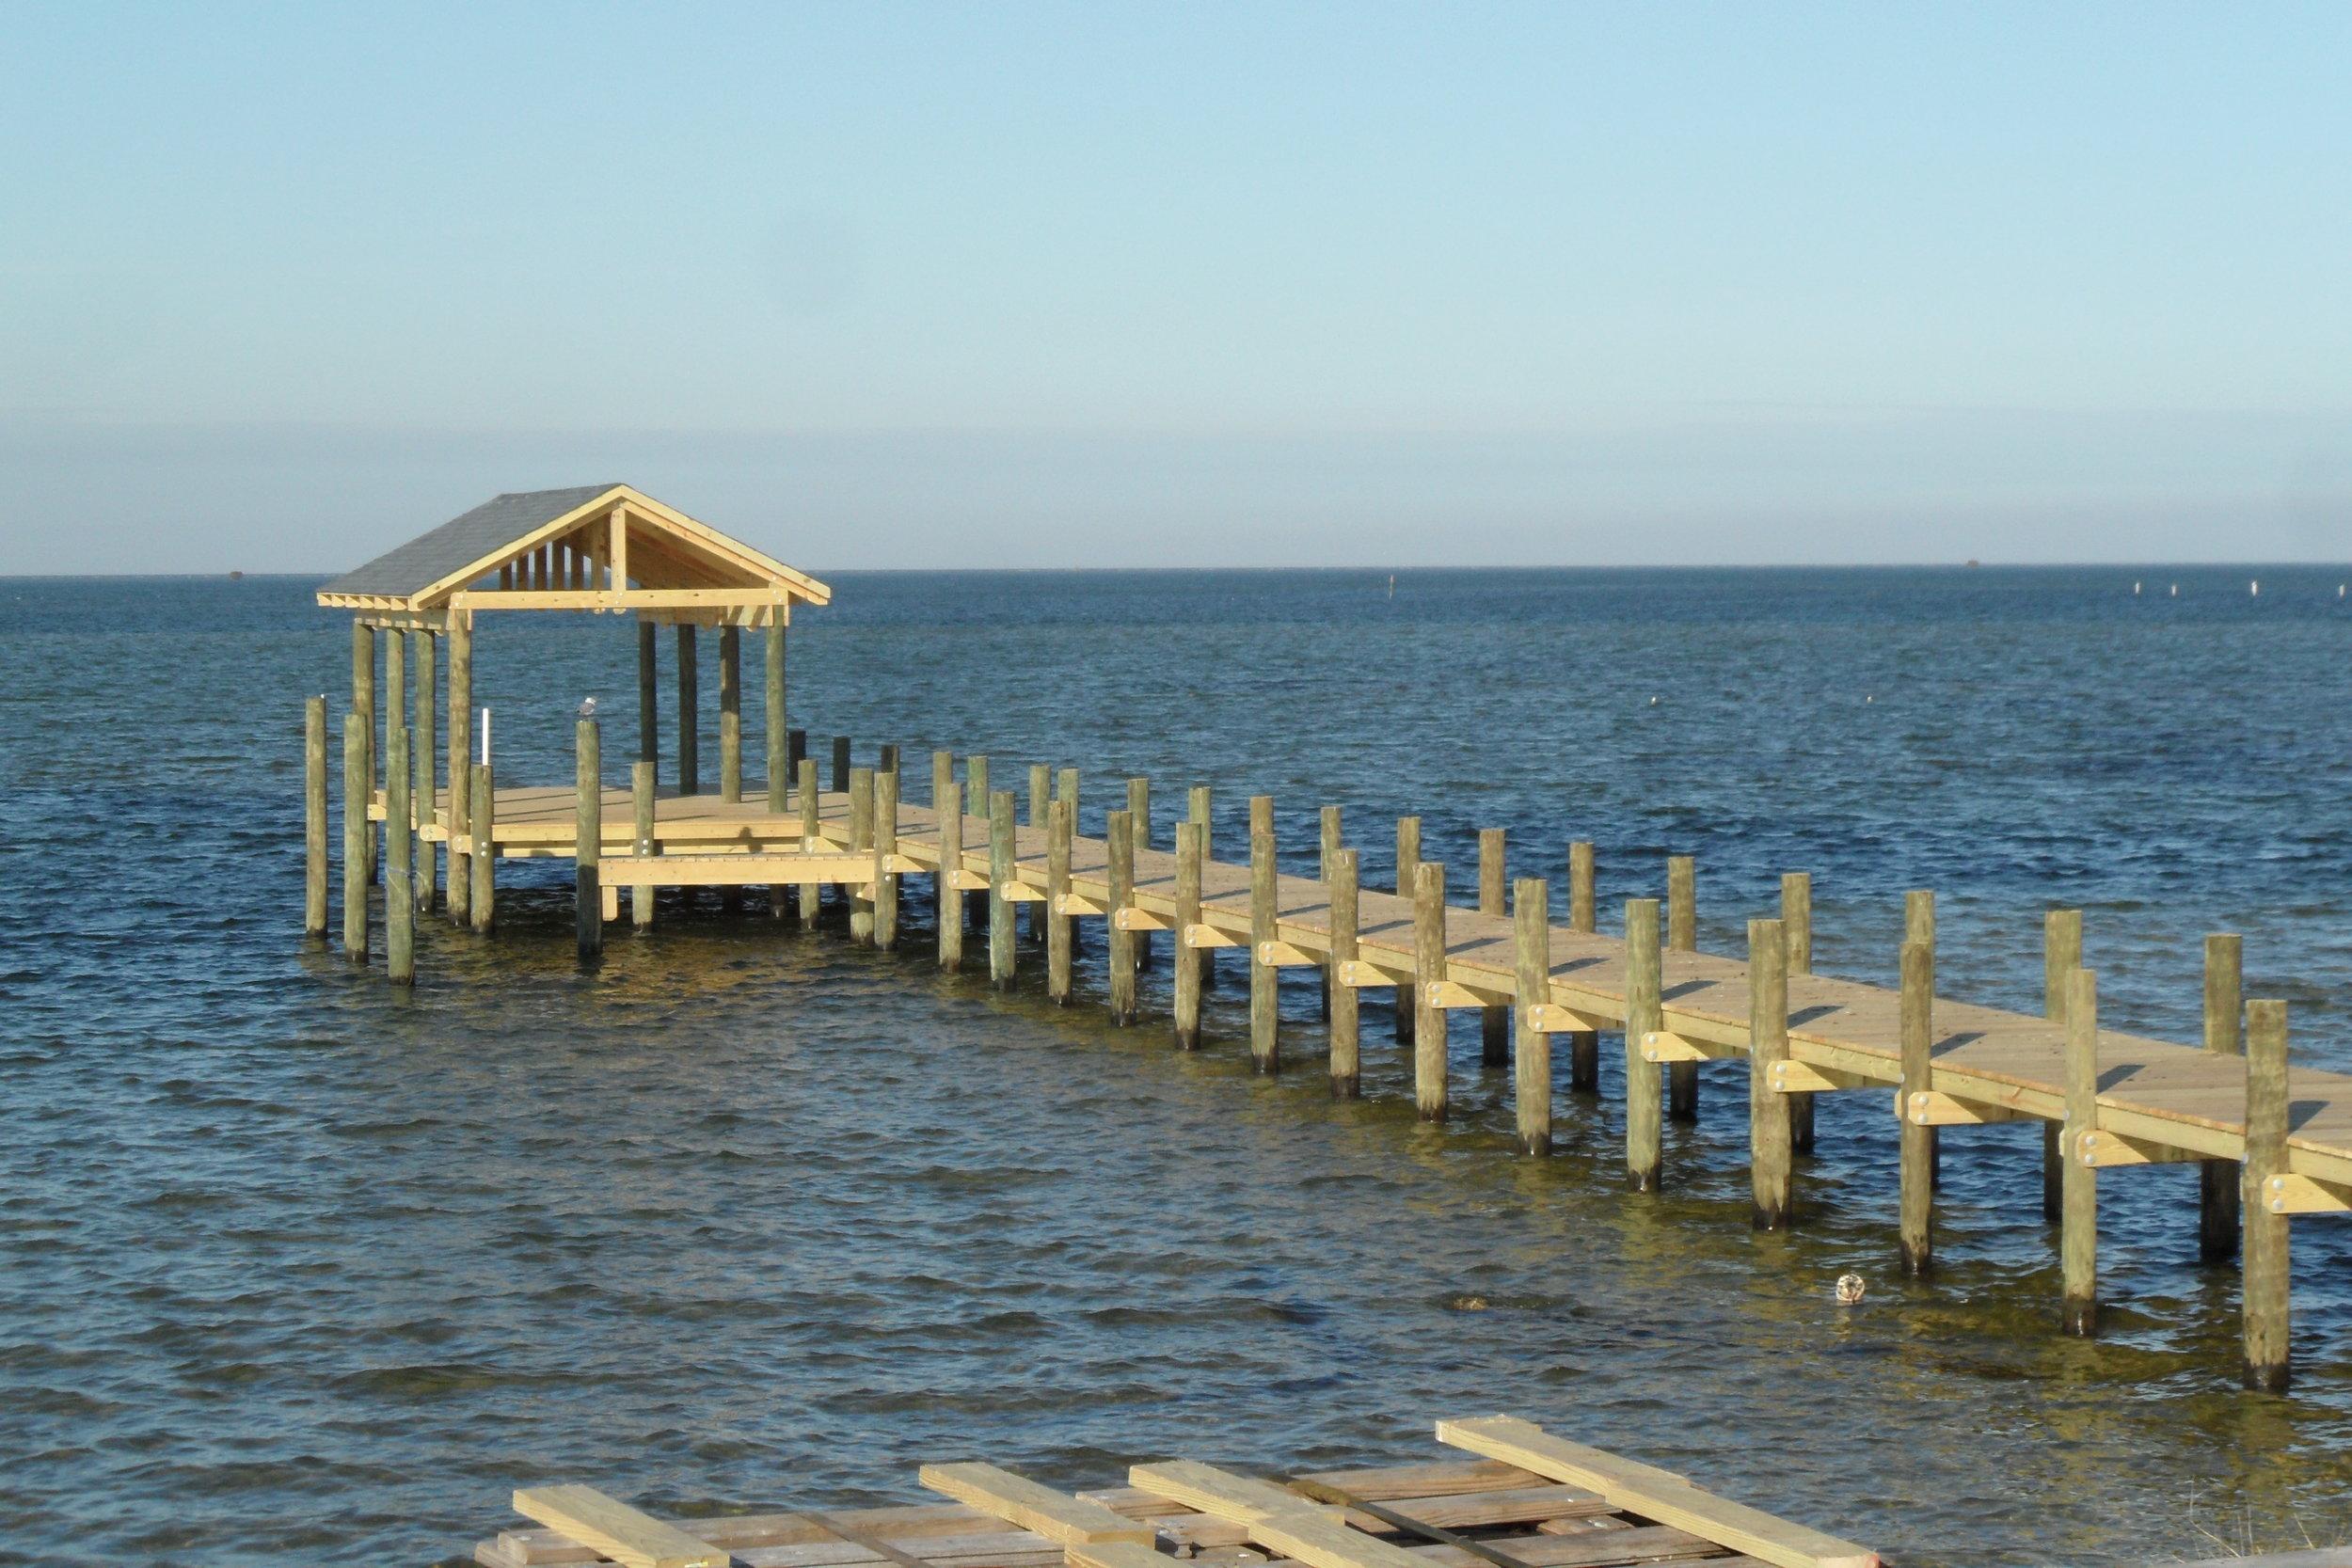 docks-piers-5.jpg